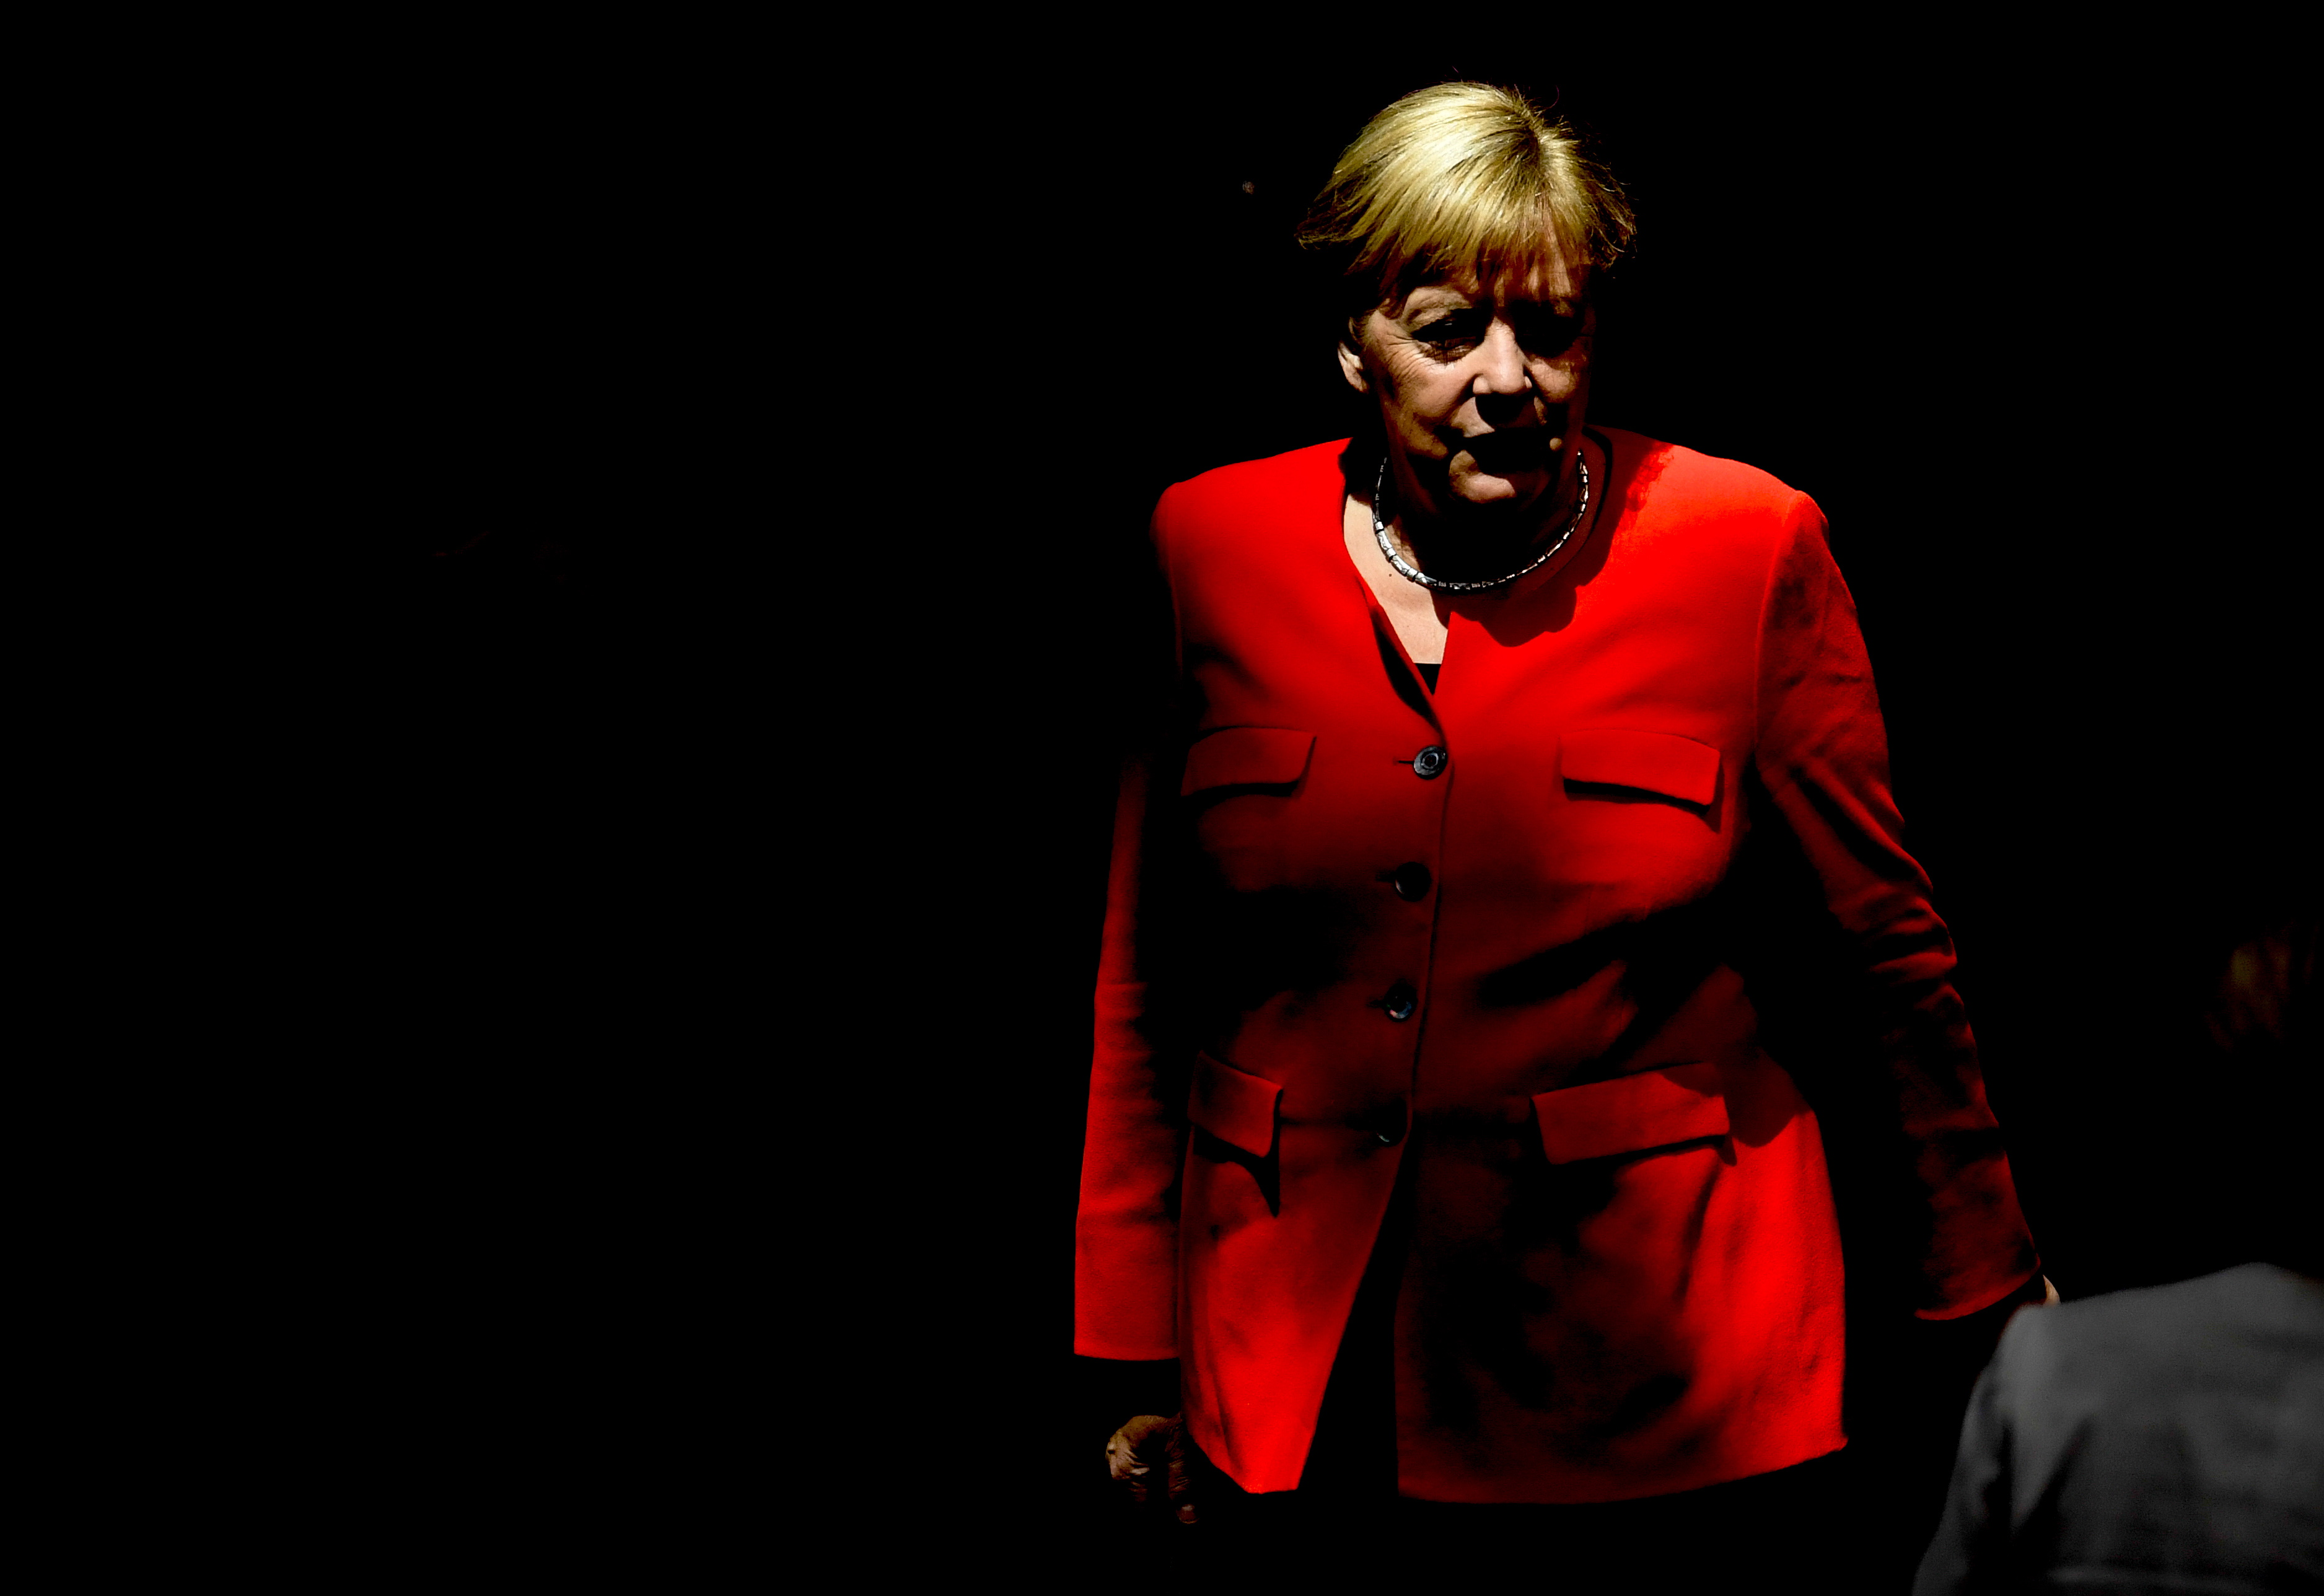 Merkel otpustila šefa obavještajne službe kako bi spasila koaliciju